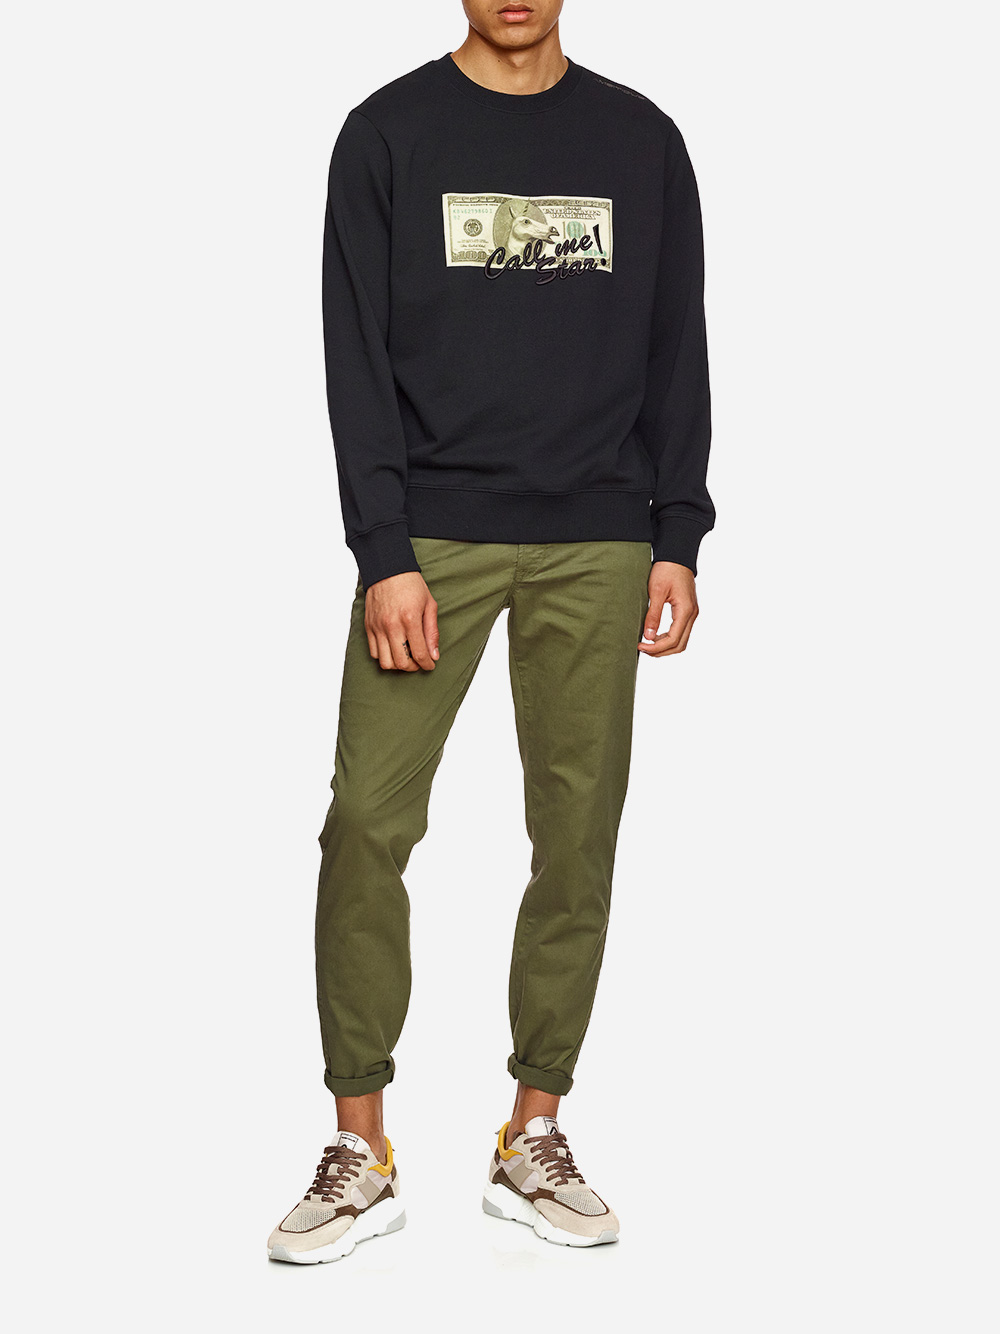 Printed Black Sweater